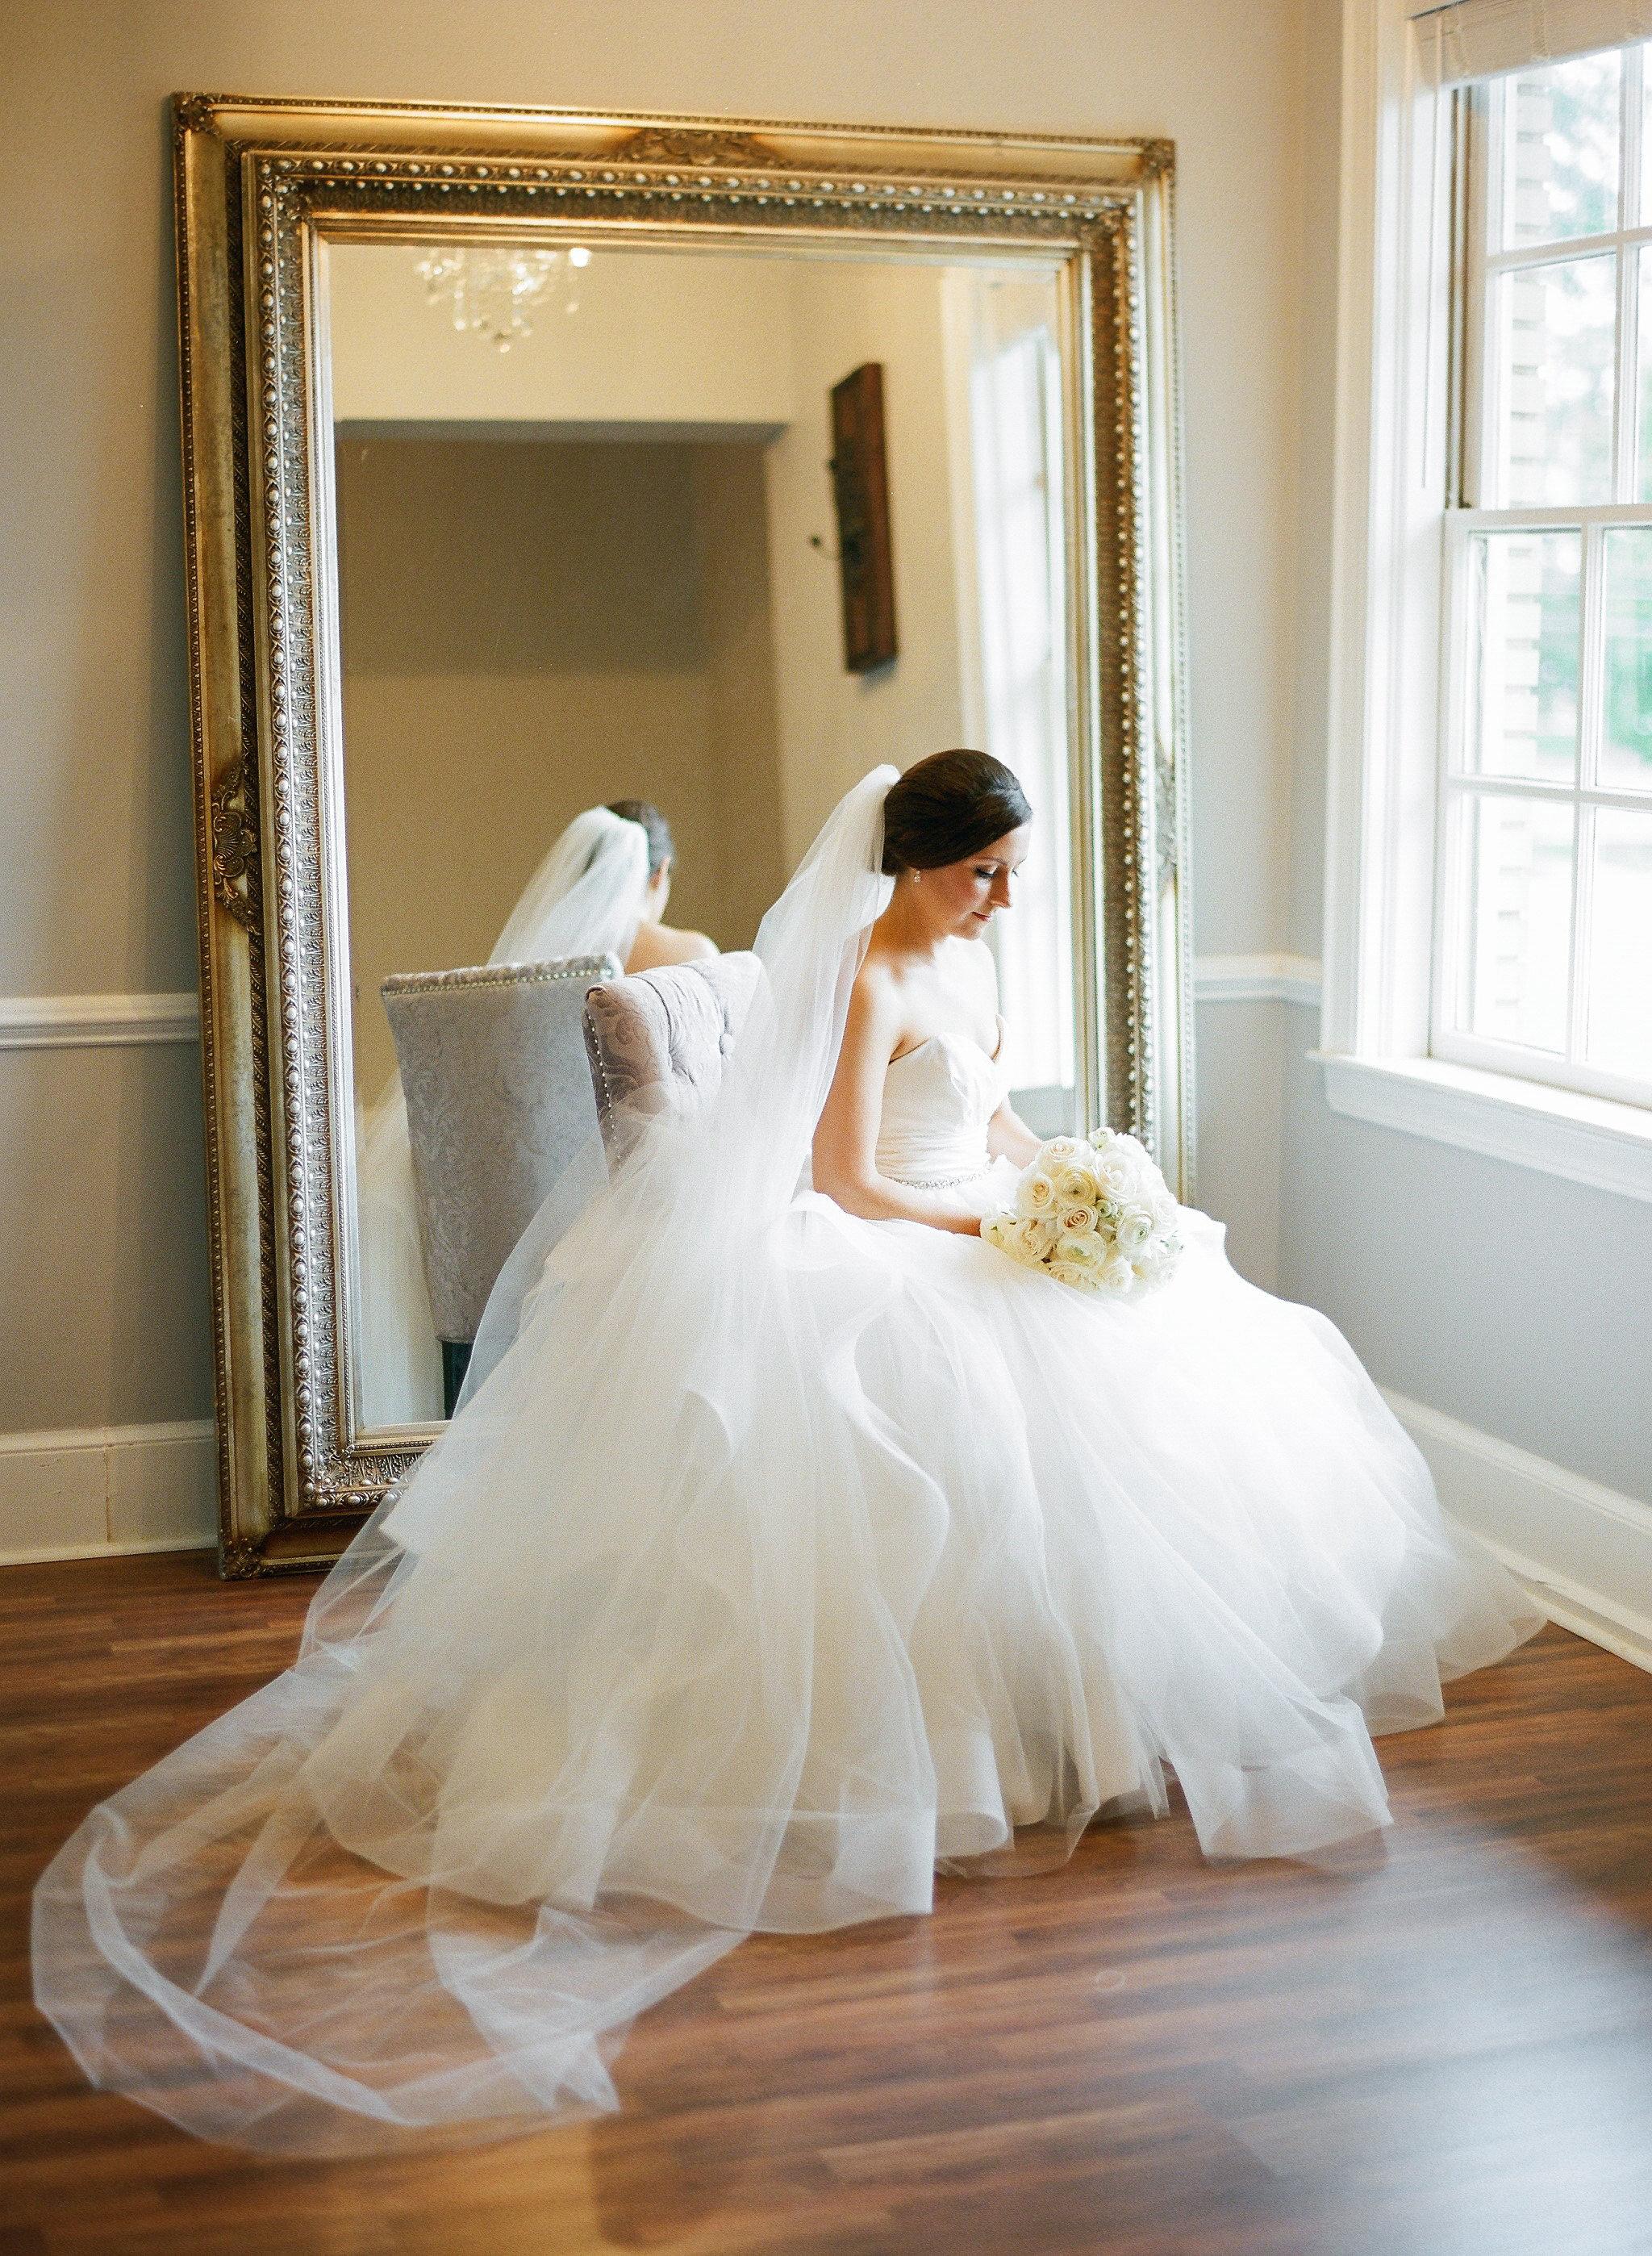 North-Carolina-Bridal-Photographer-Rebecca-10.jpg